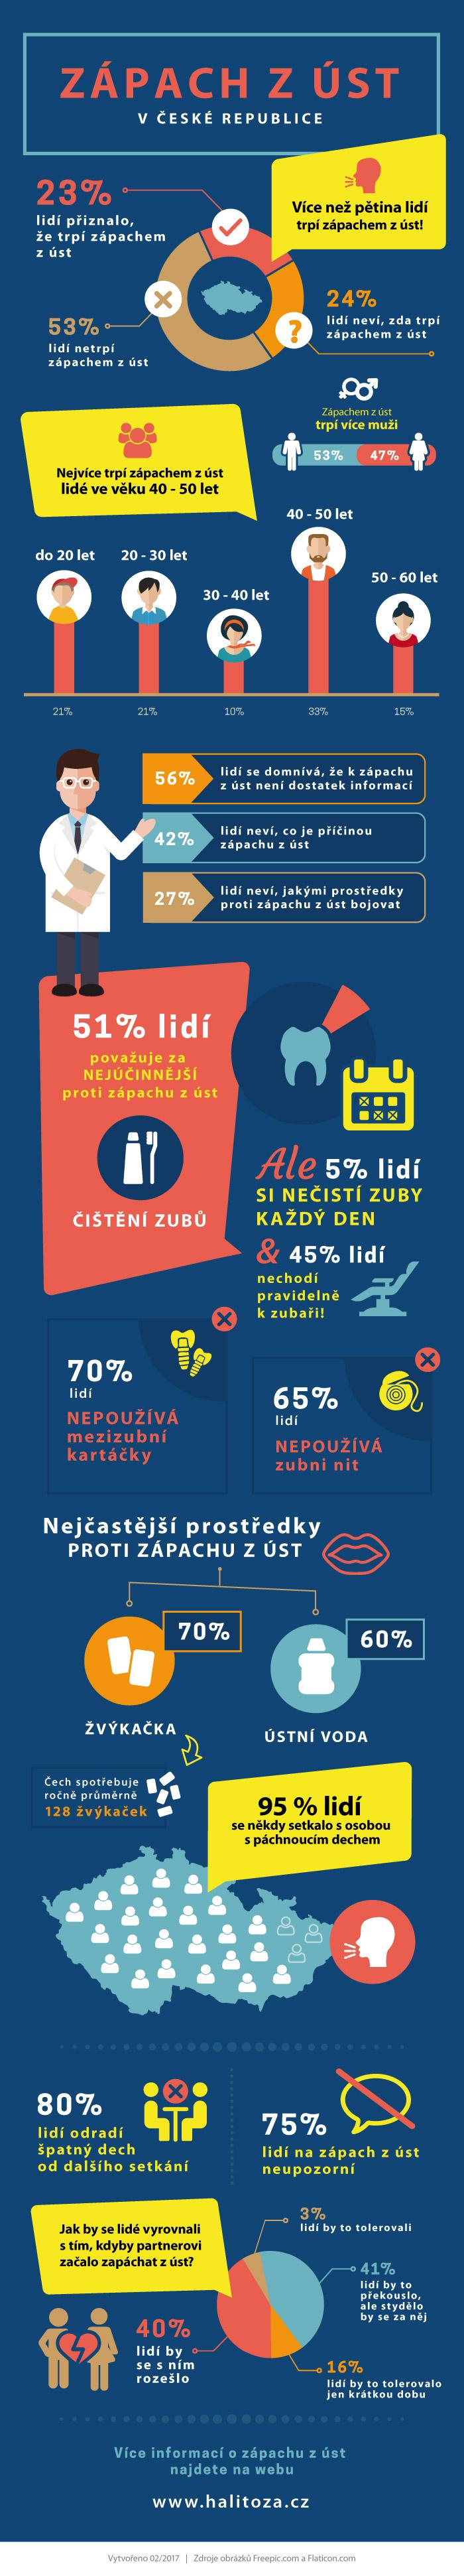 Zápach z úst v České republice - infografika, statistika, průzkum